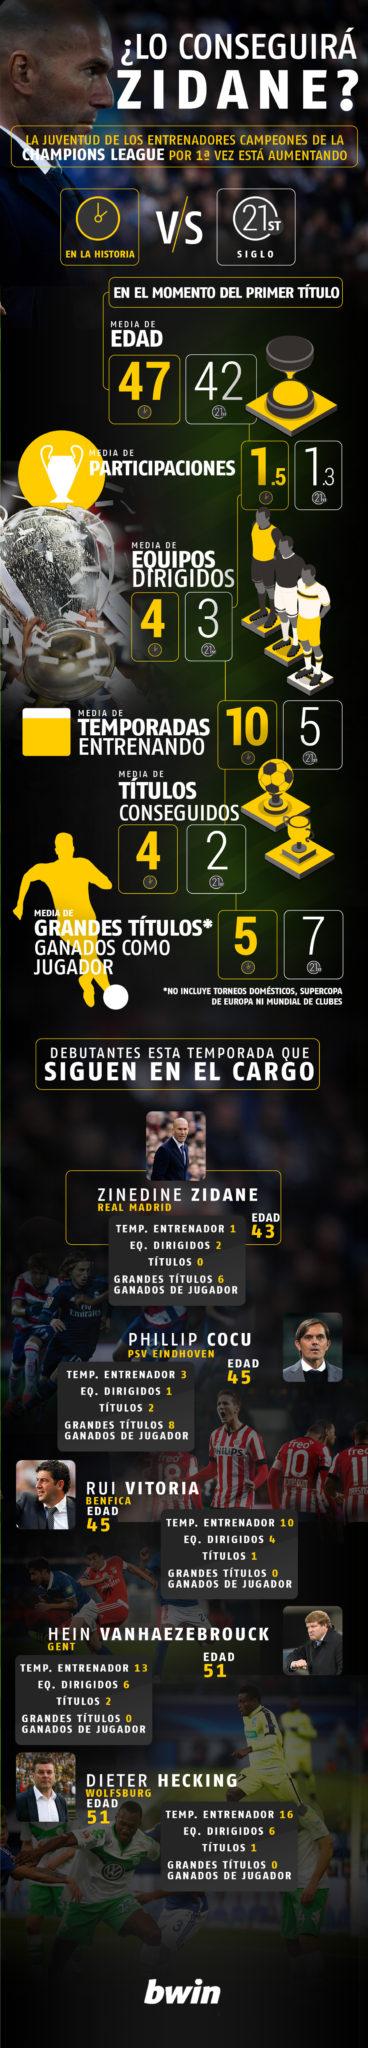 Zidane infographic Bwin